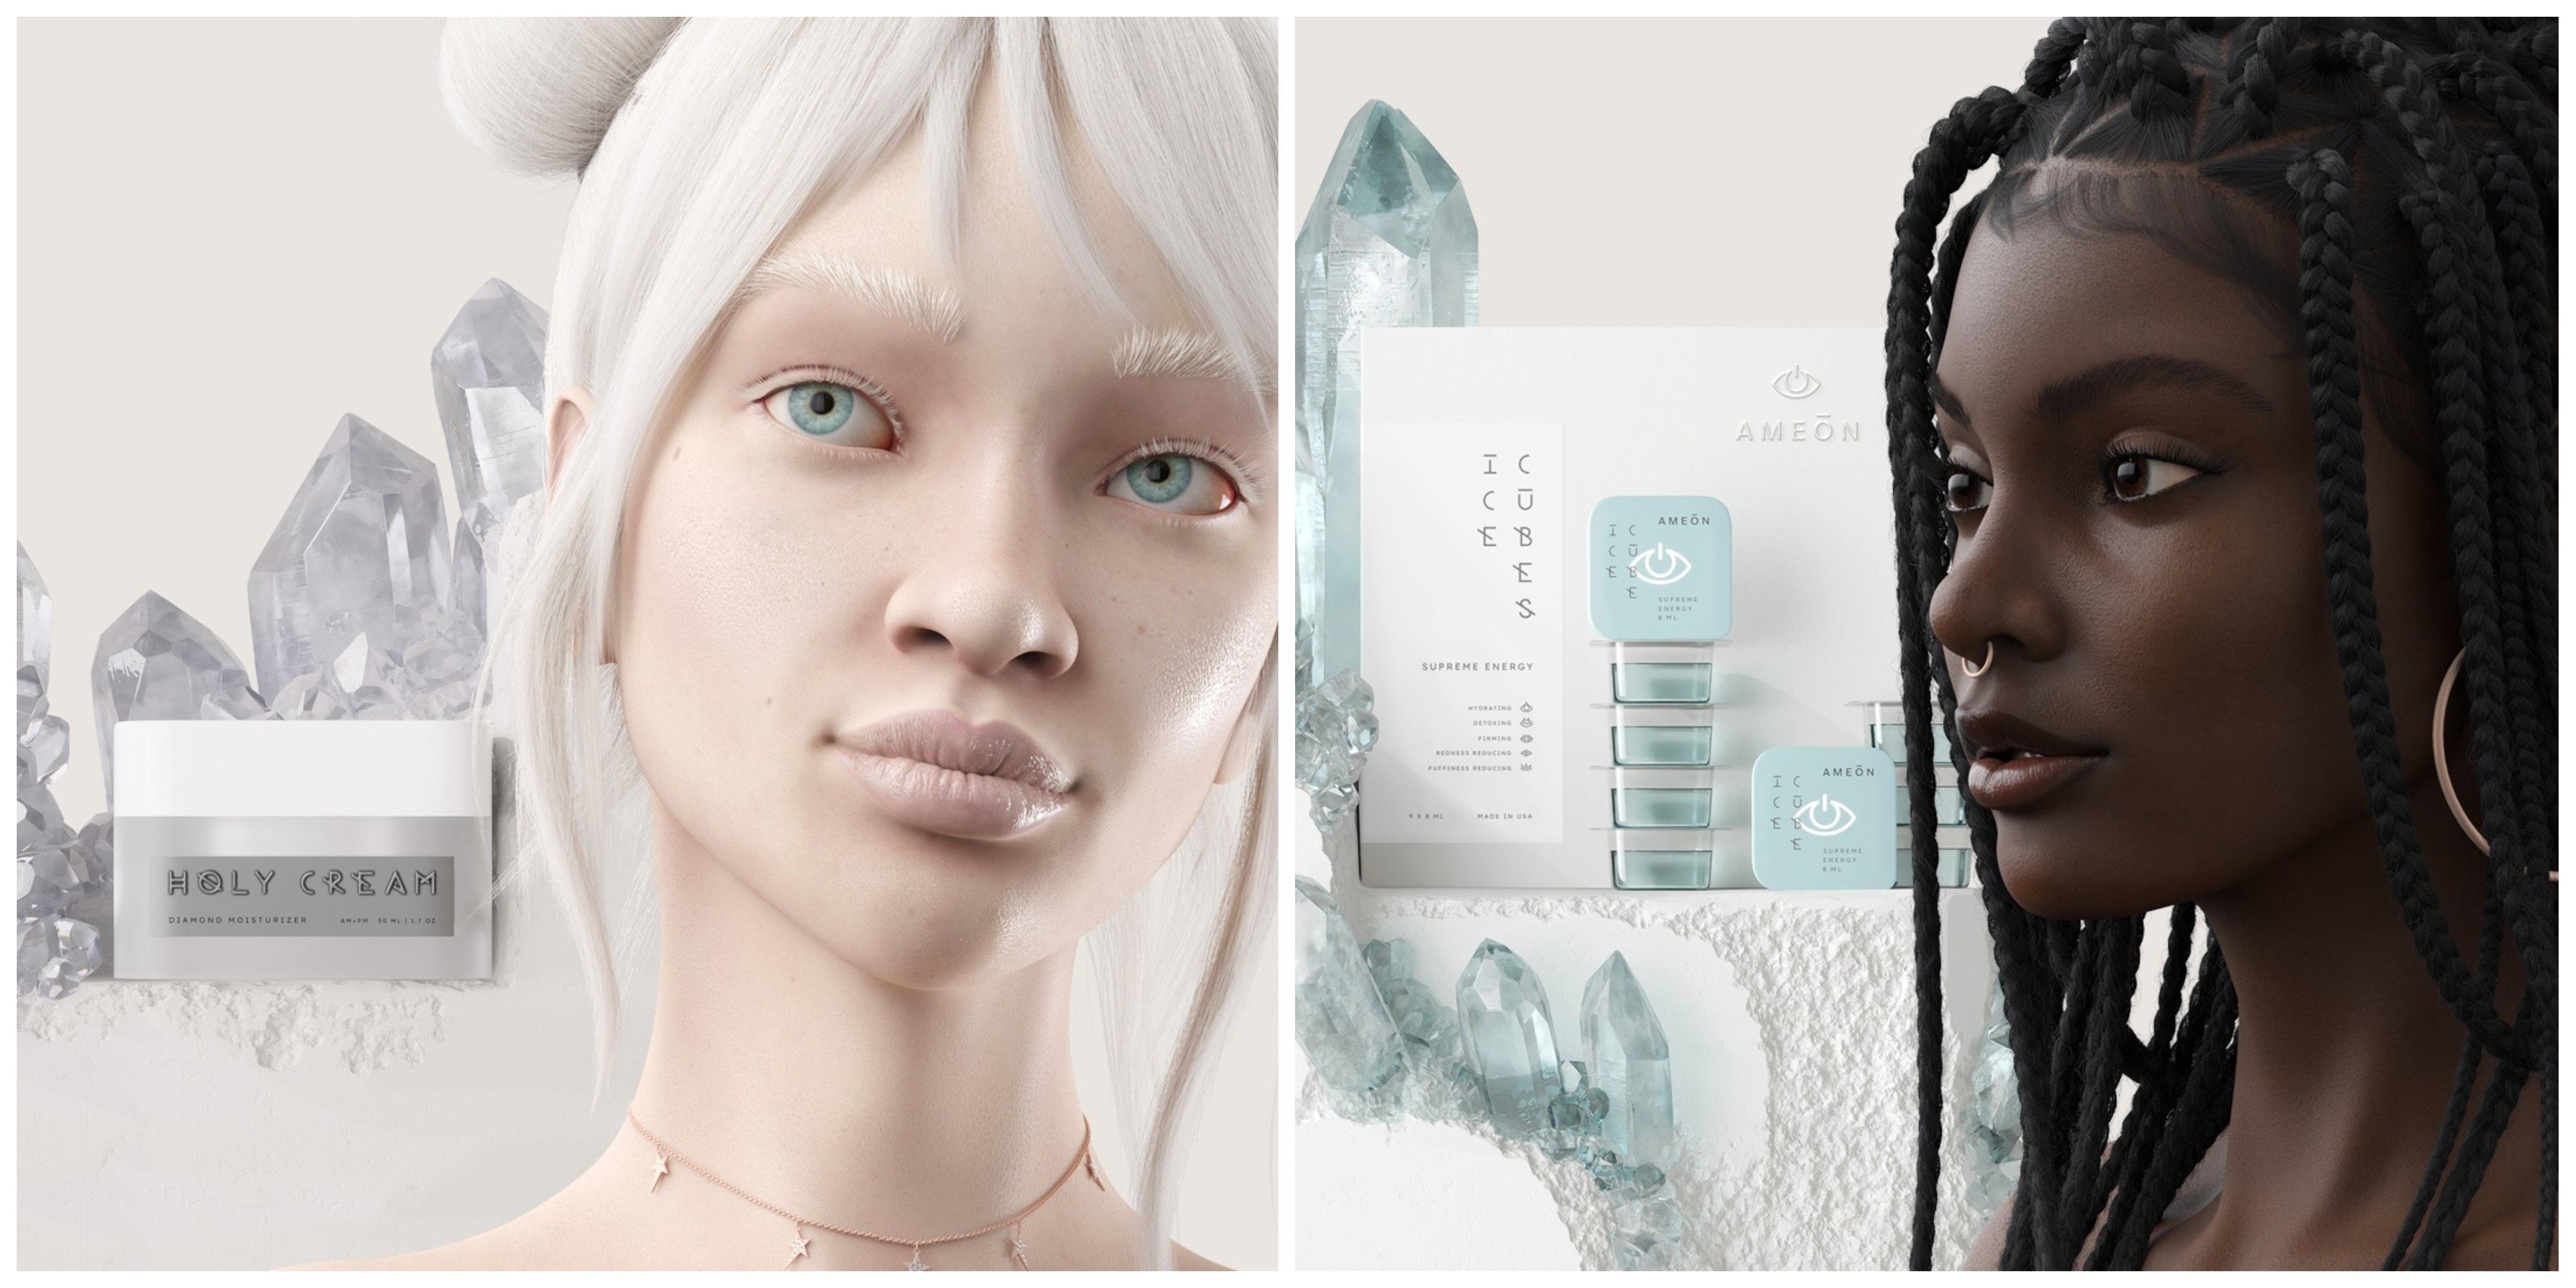 Meet A Next Generation Multifunctional Skincare Ecology